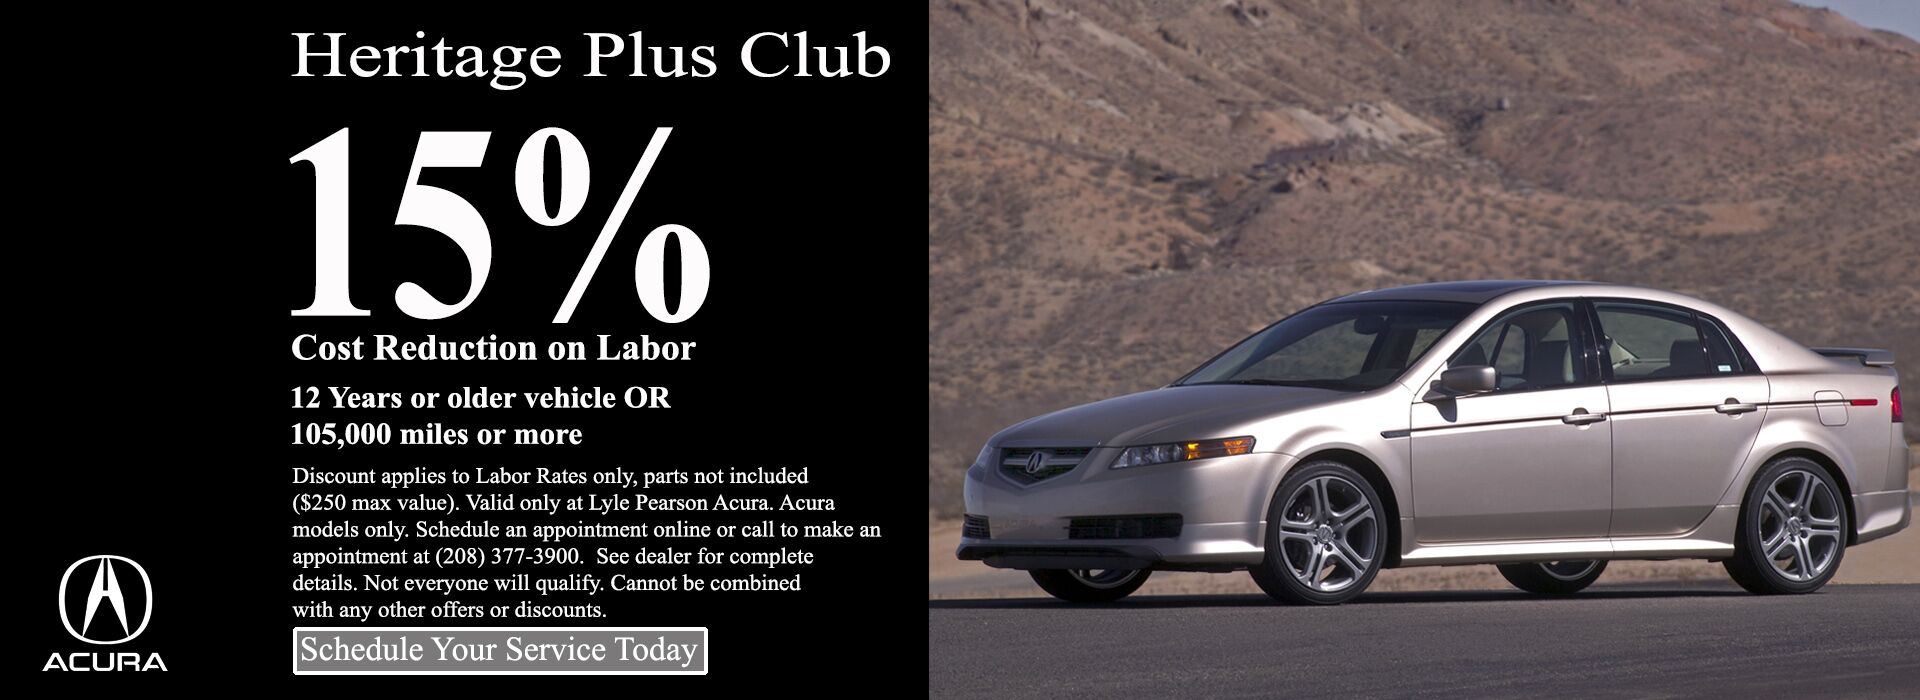 Boise Idaho Acura Dealership Lyle Pearson Acura - Discount acura parts